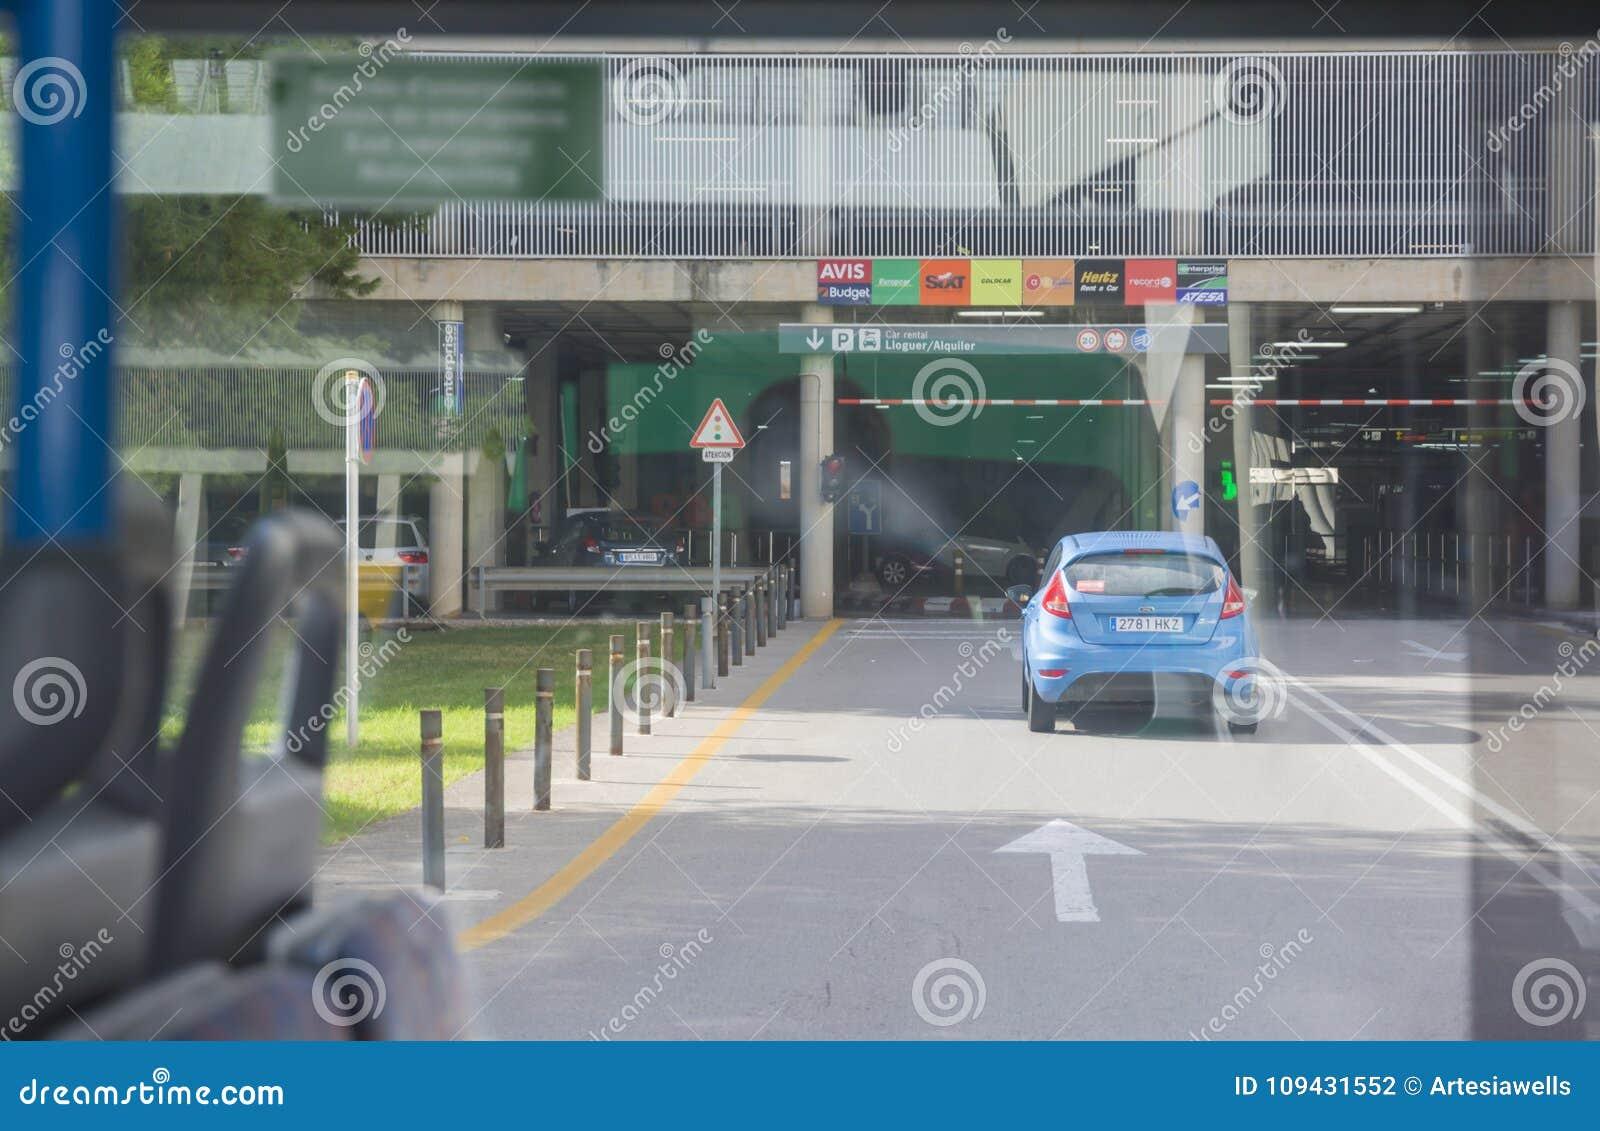 Rental Car Returned To Airport Parking Garage Editorial